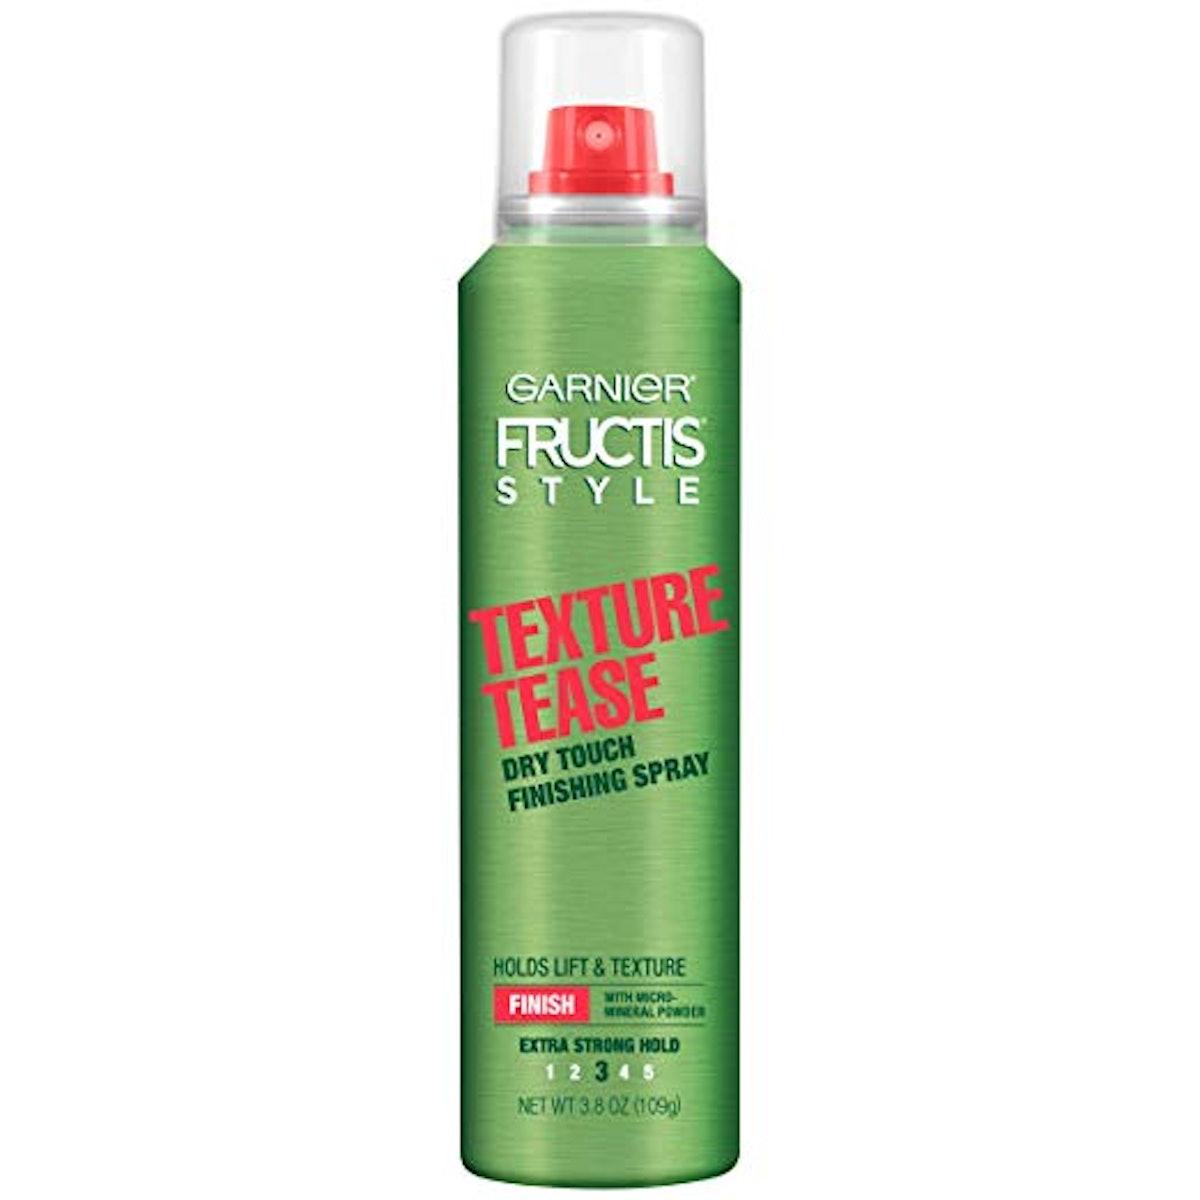 Garnier Fructis Texture Tease Dry Touch Finishing Spray